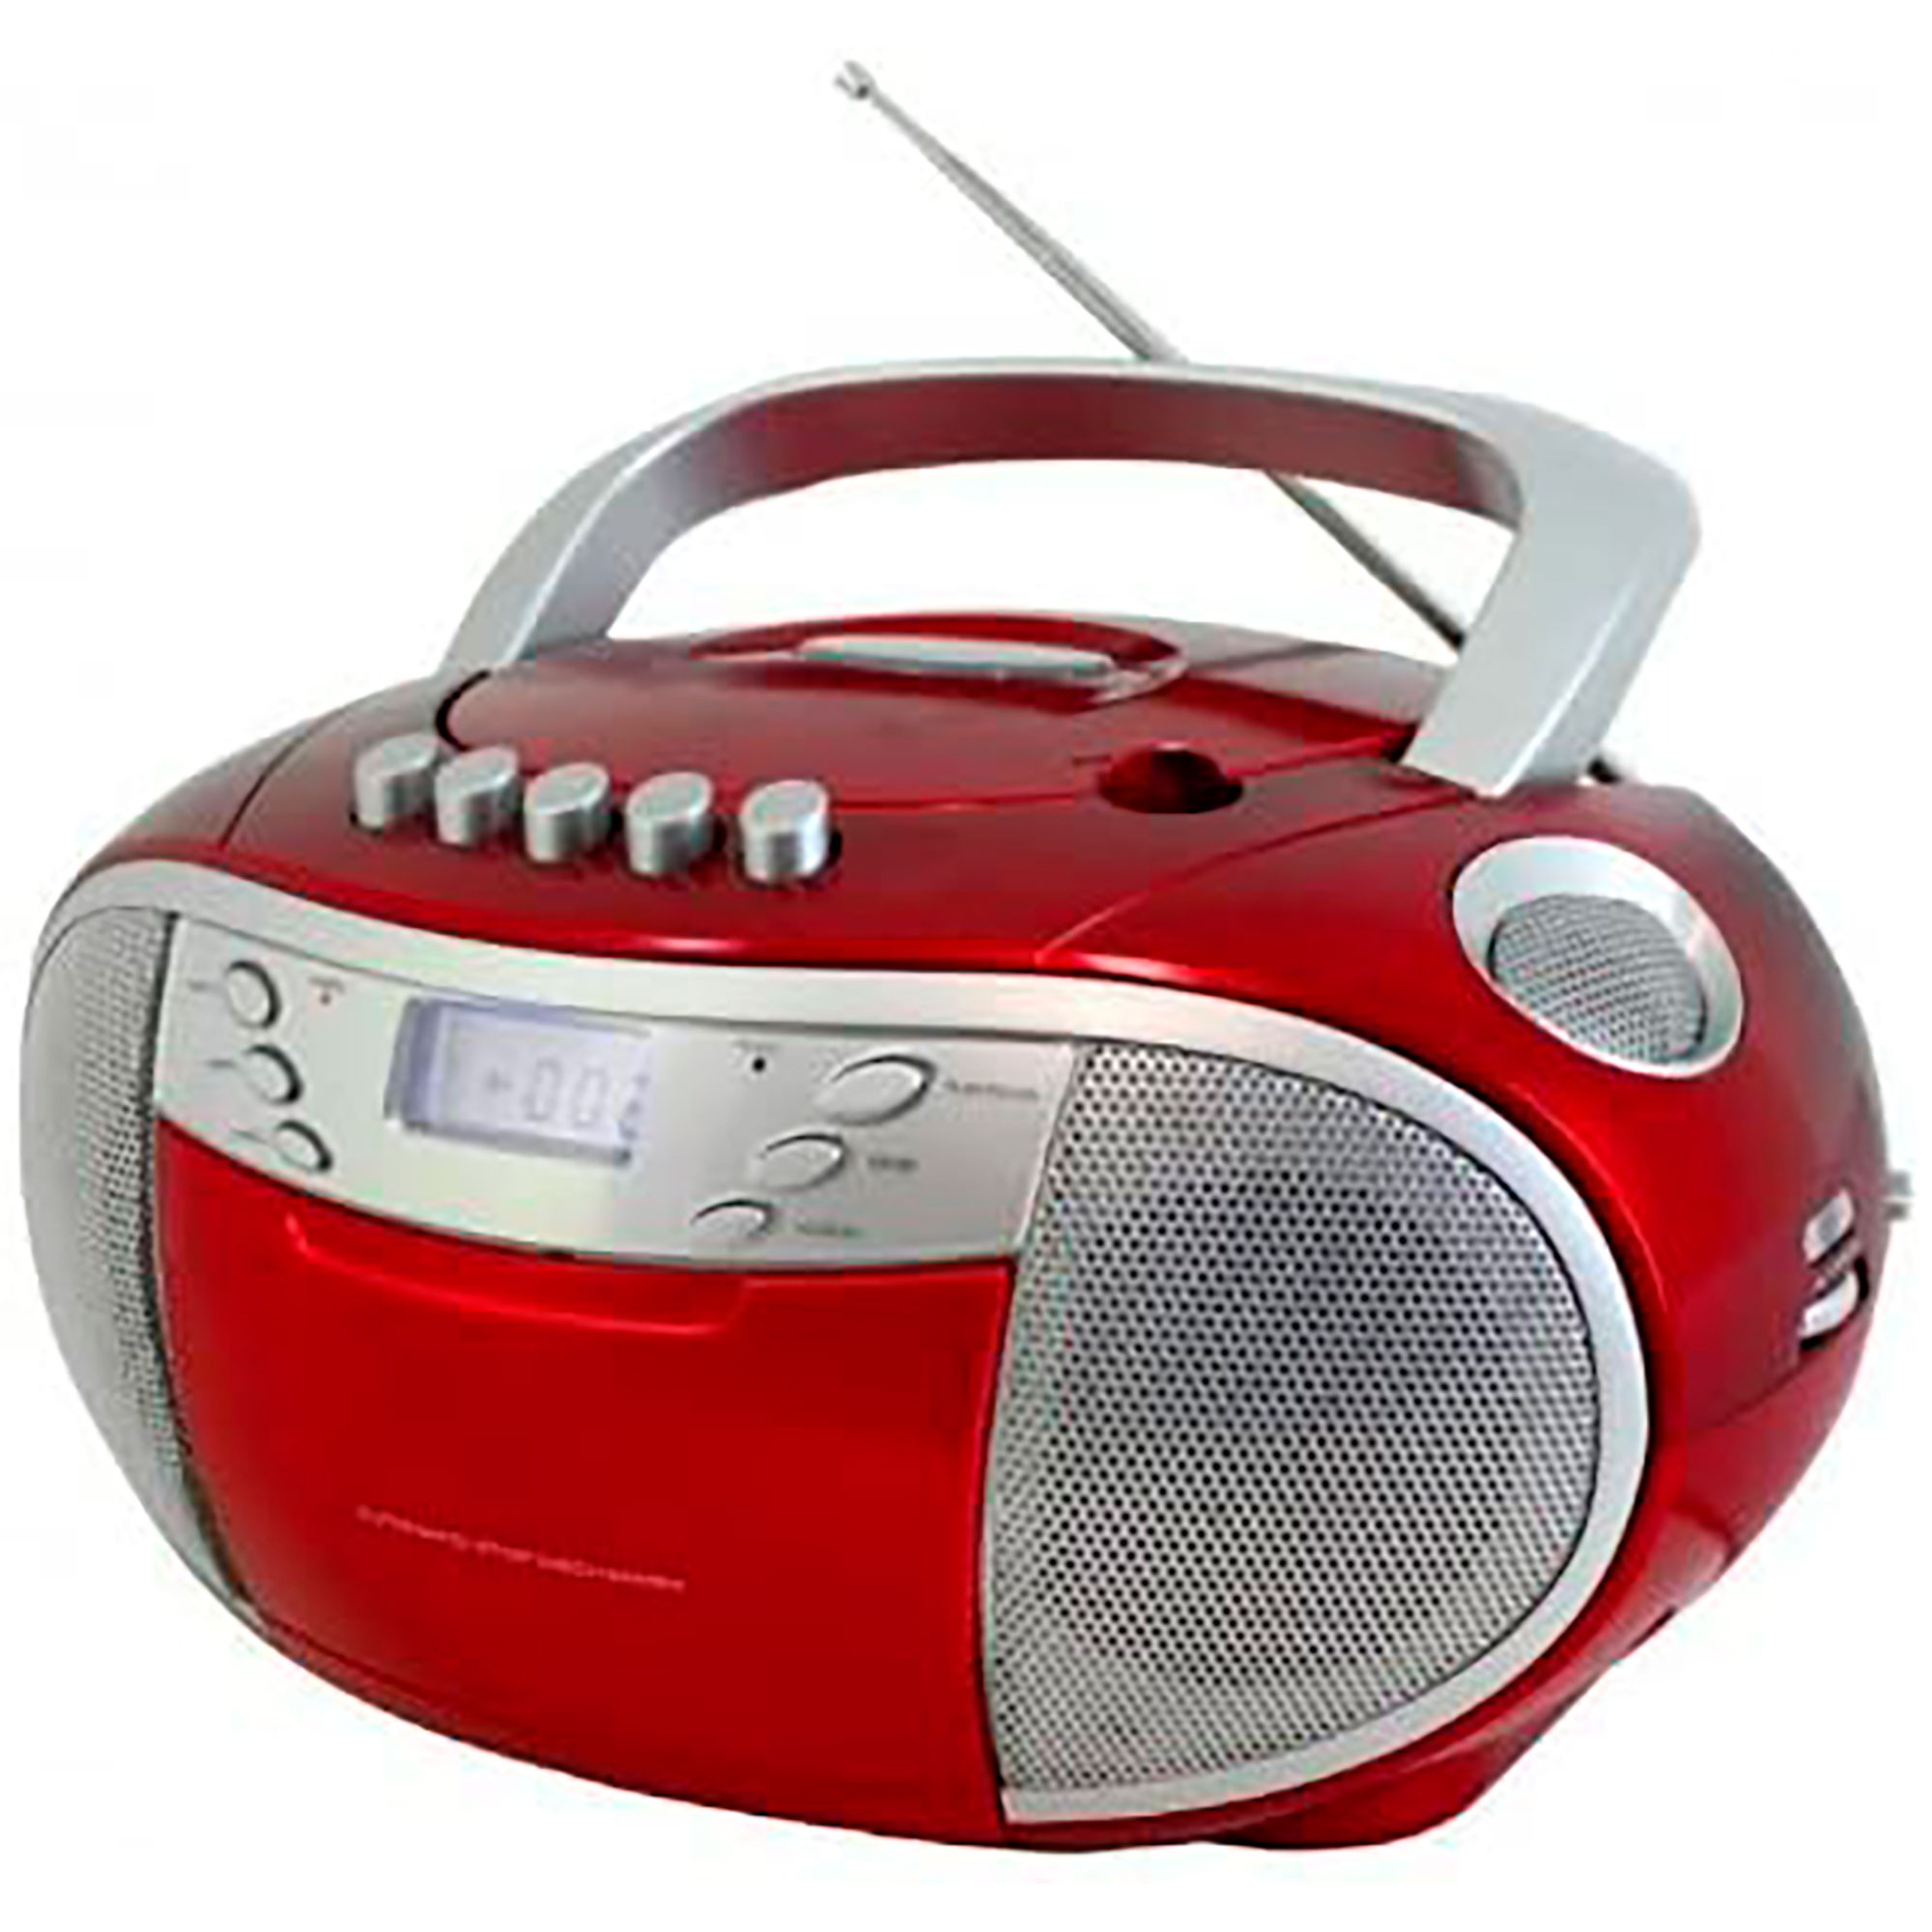 Soundmaster SCD6900RO Radio, Portátil AM/FM, Reproductor de CD-CDR-CDRW, Cassette, Rojo